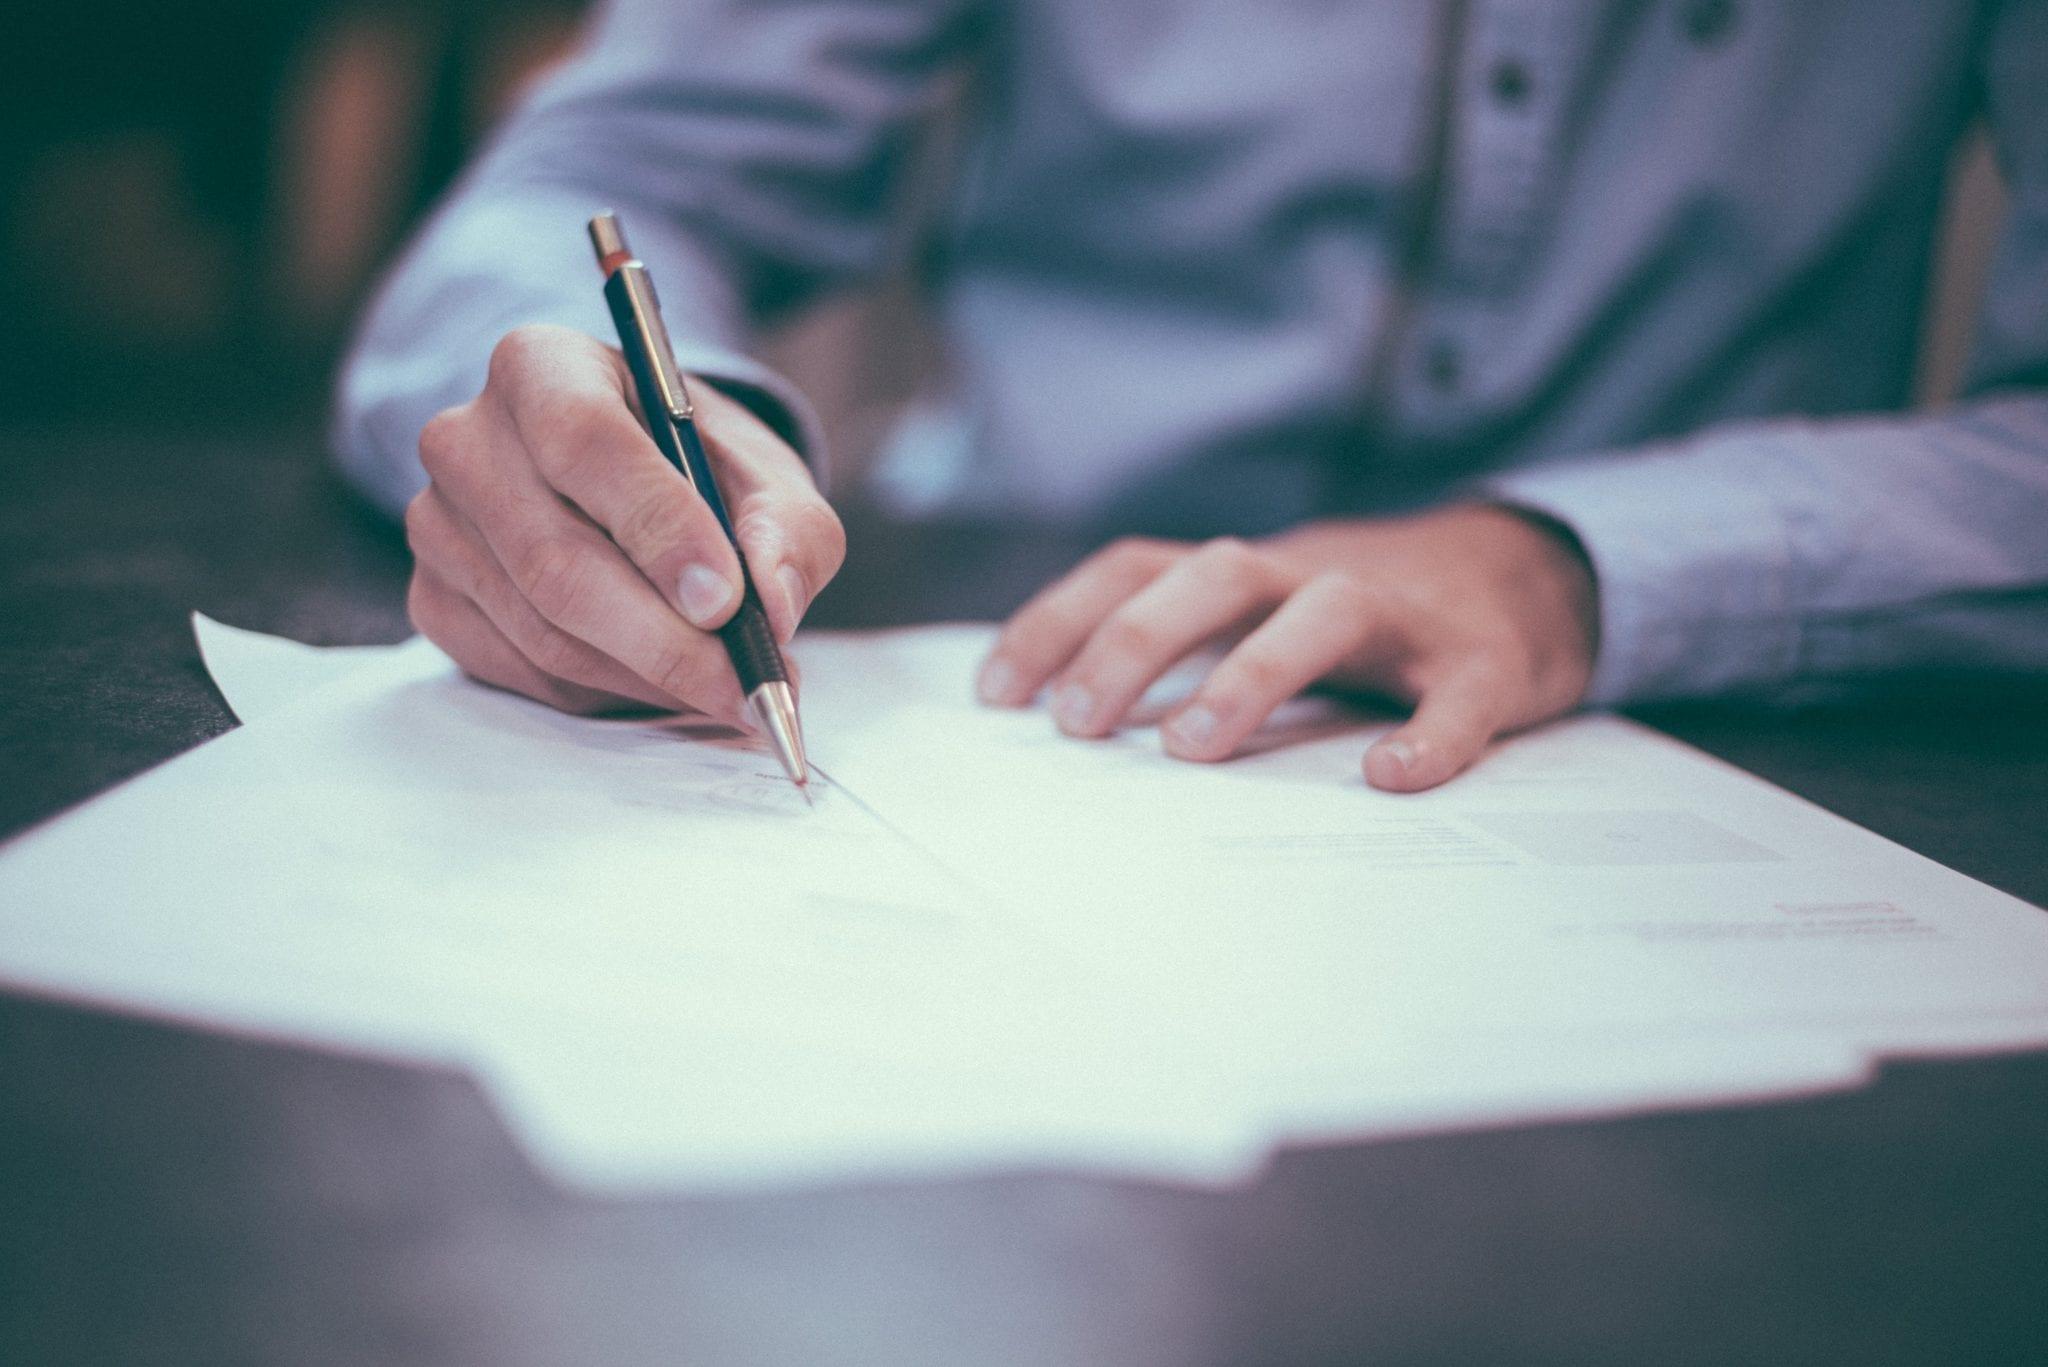 Man writing resume; image by Helloquence via Unsplash.